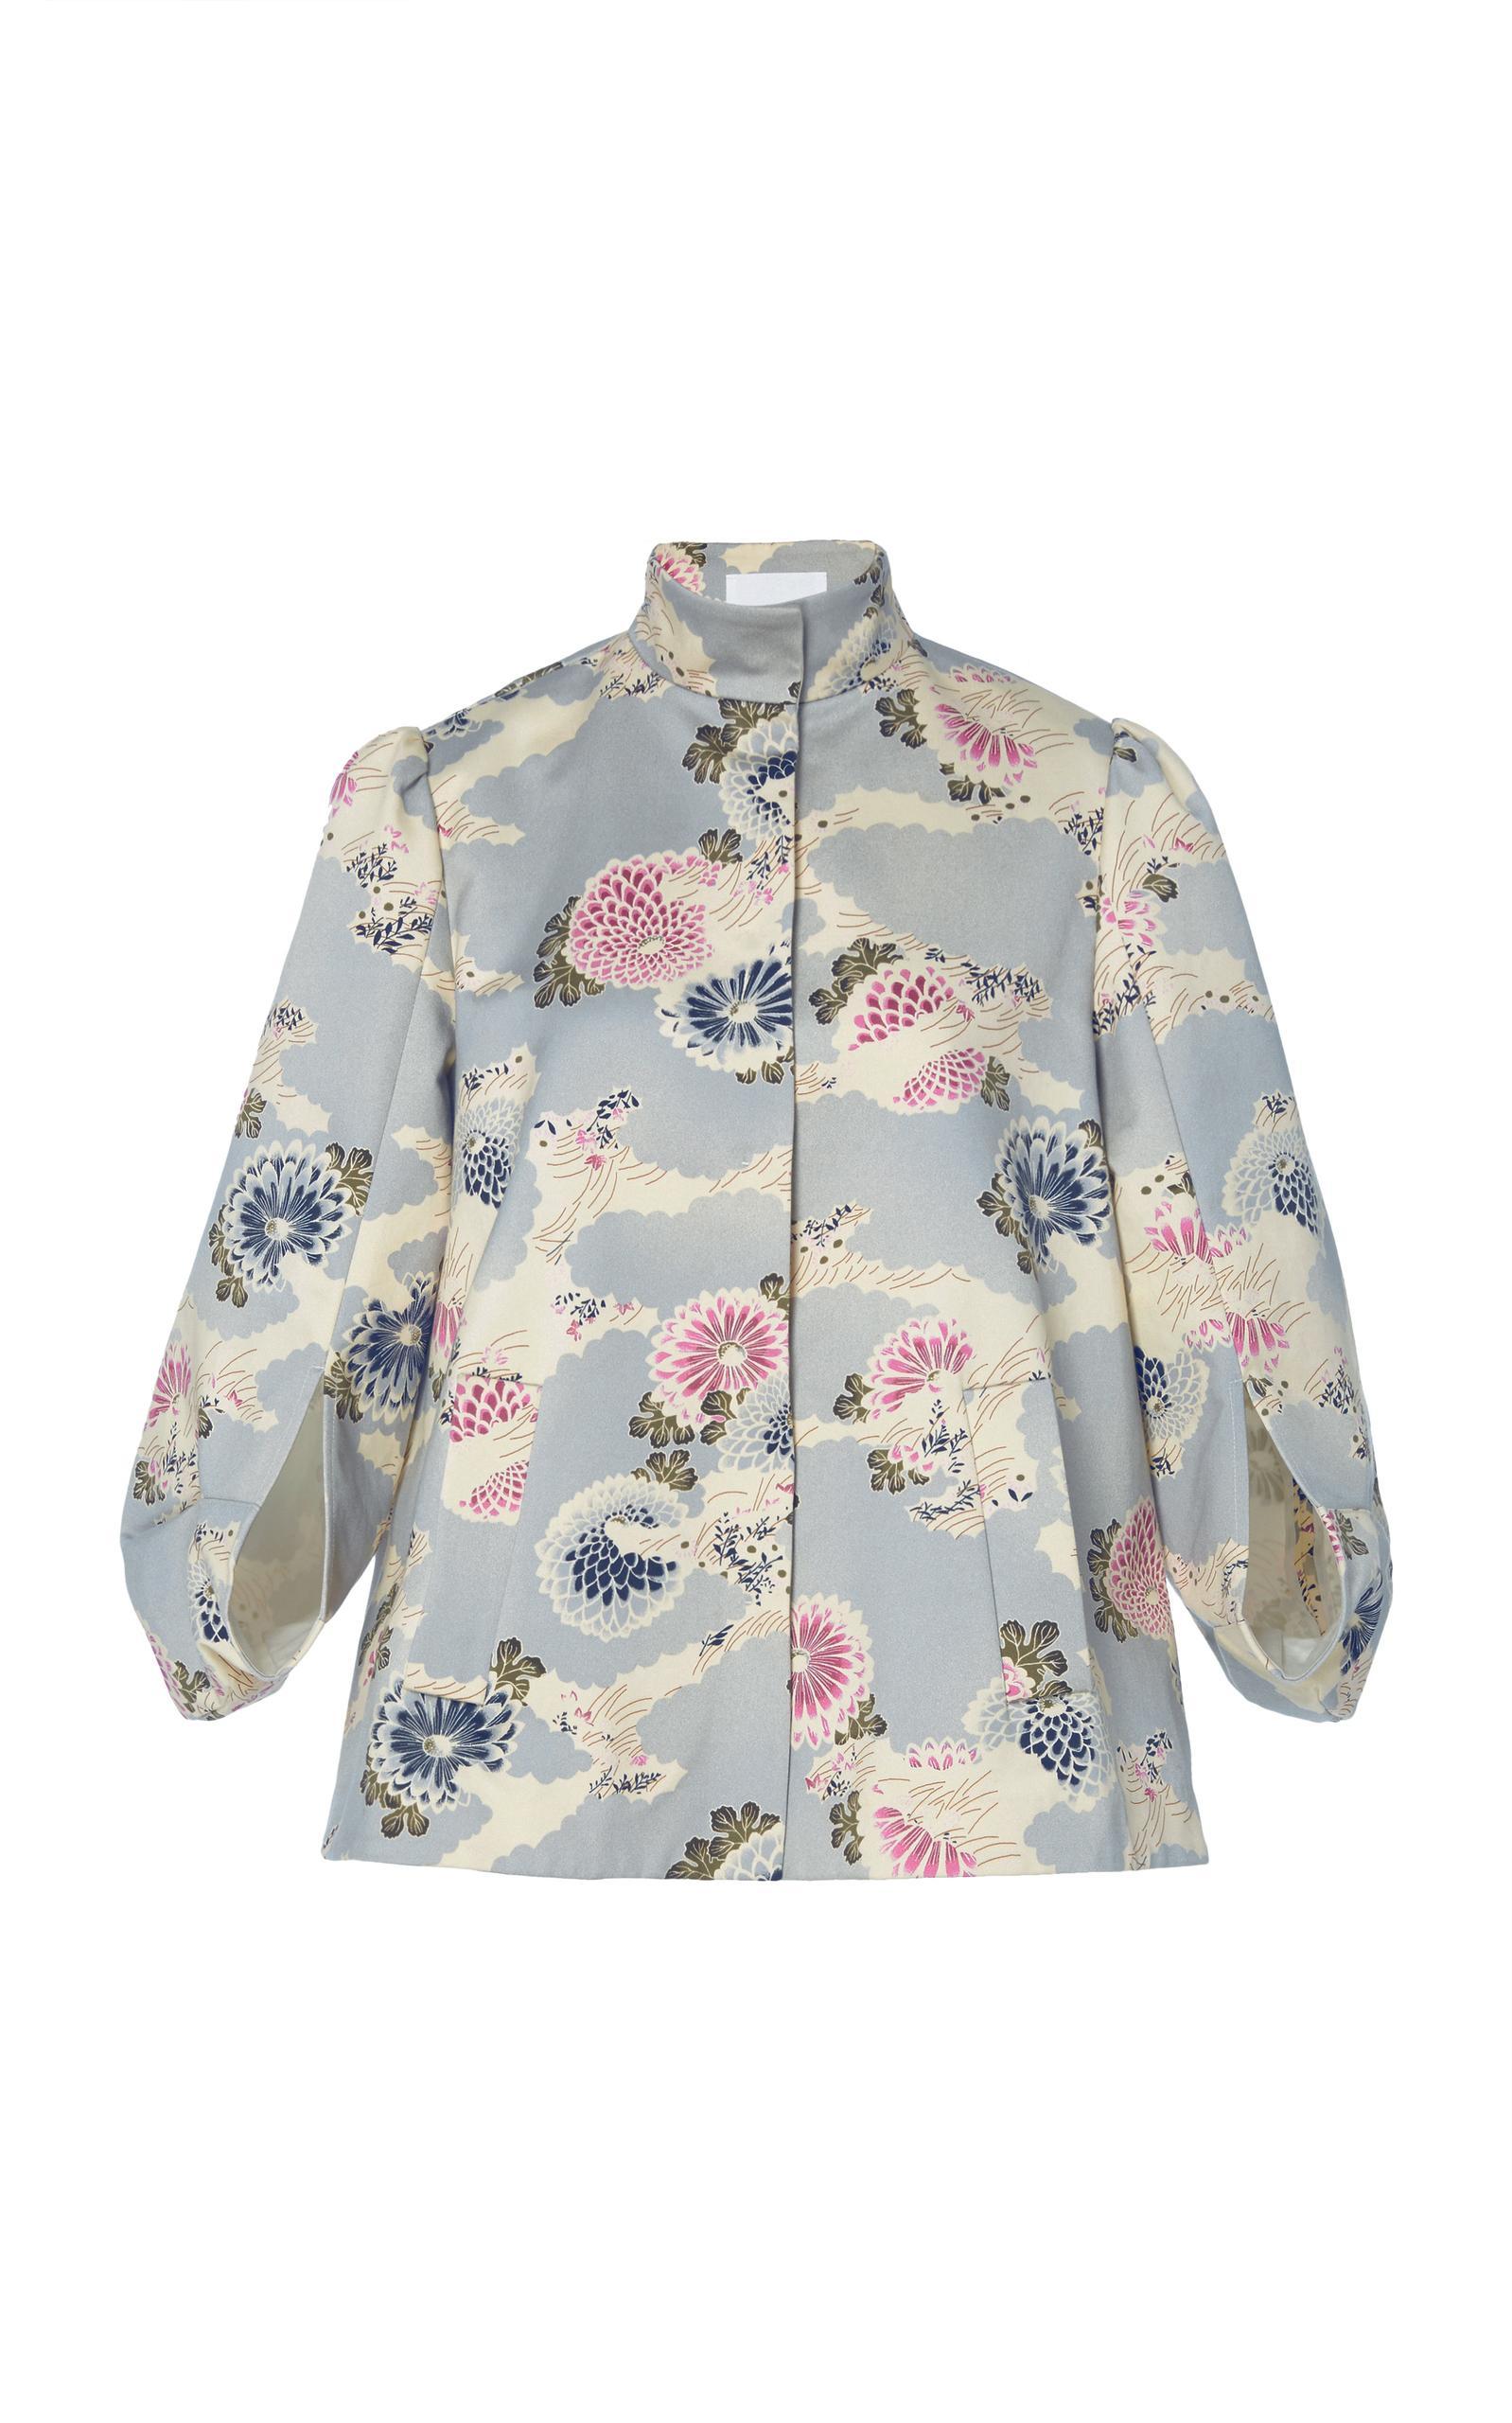 Co Bonded Satin Printed Jacket